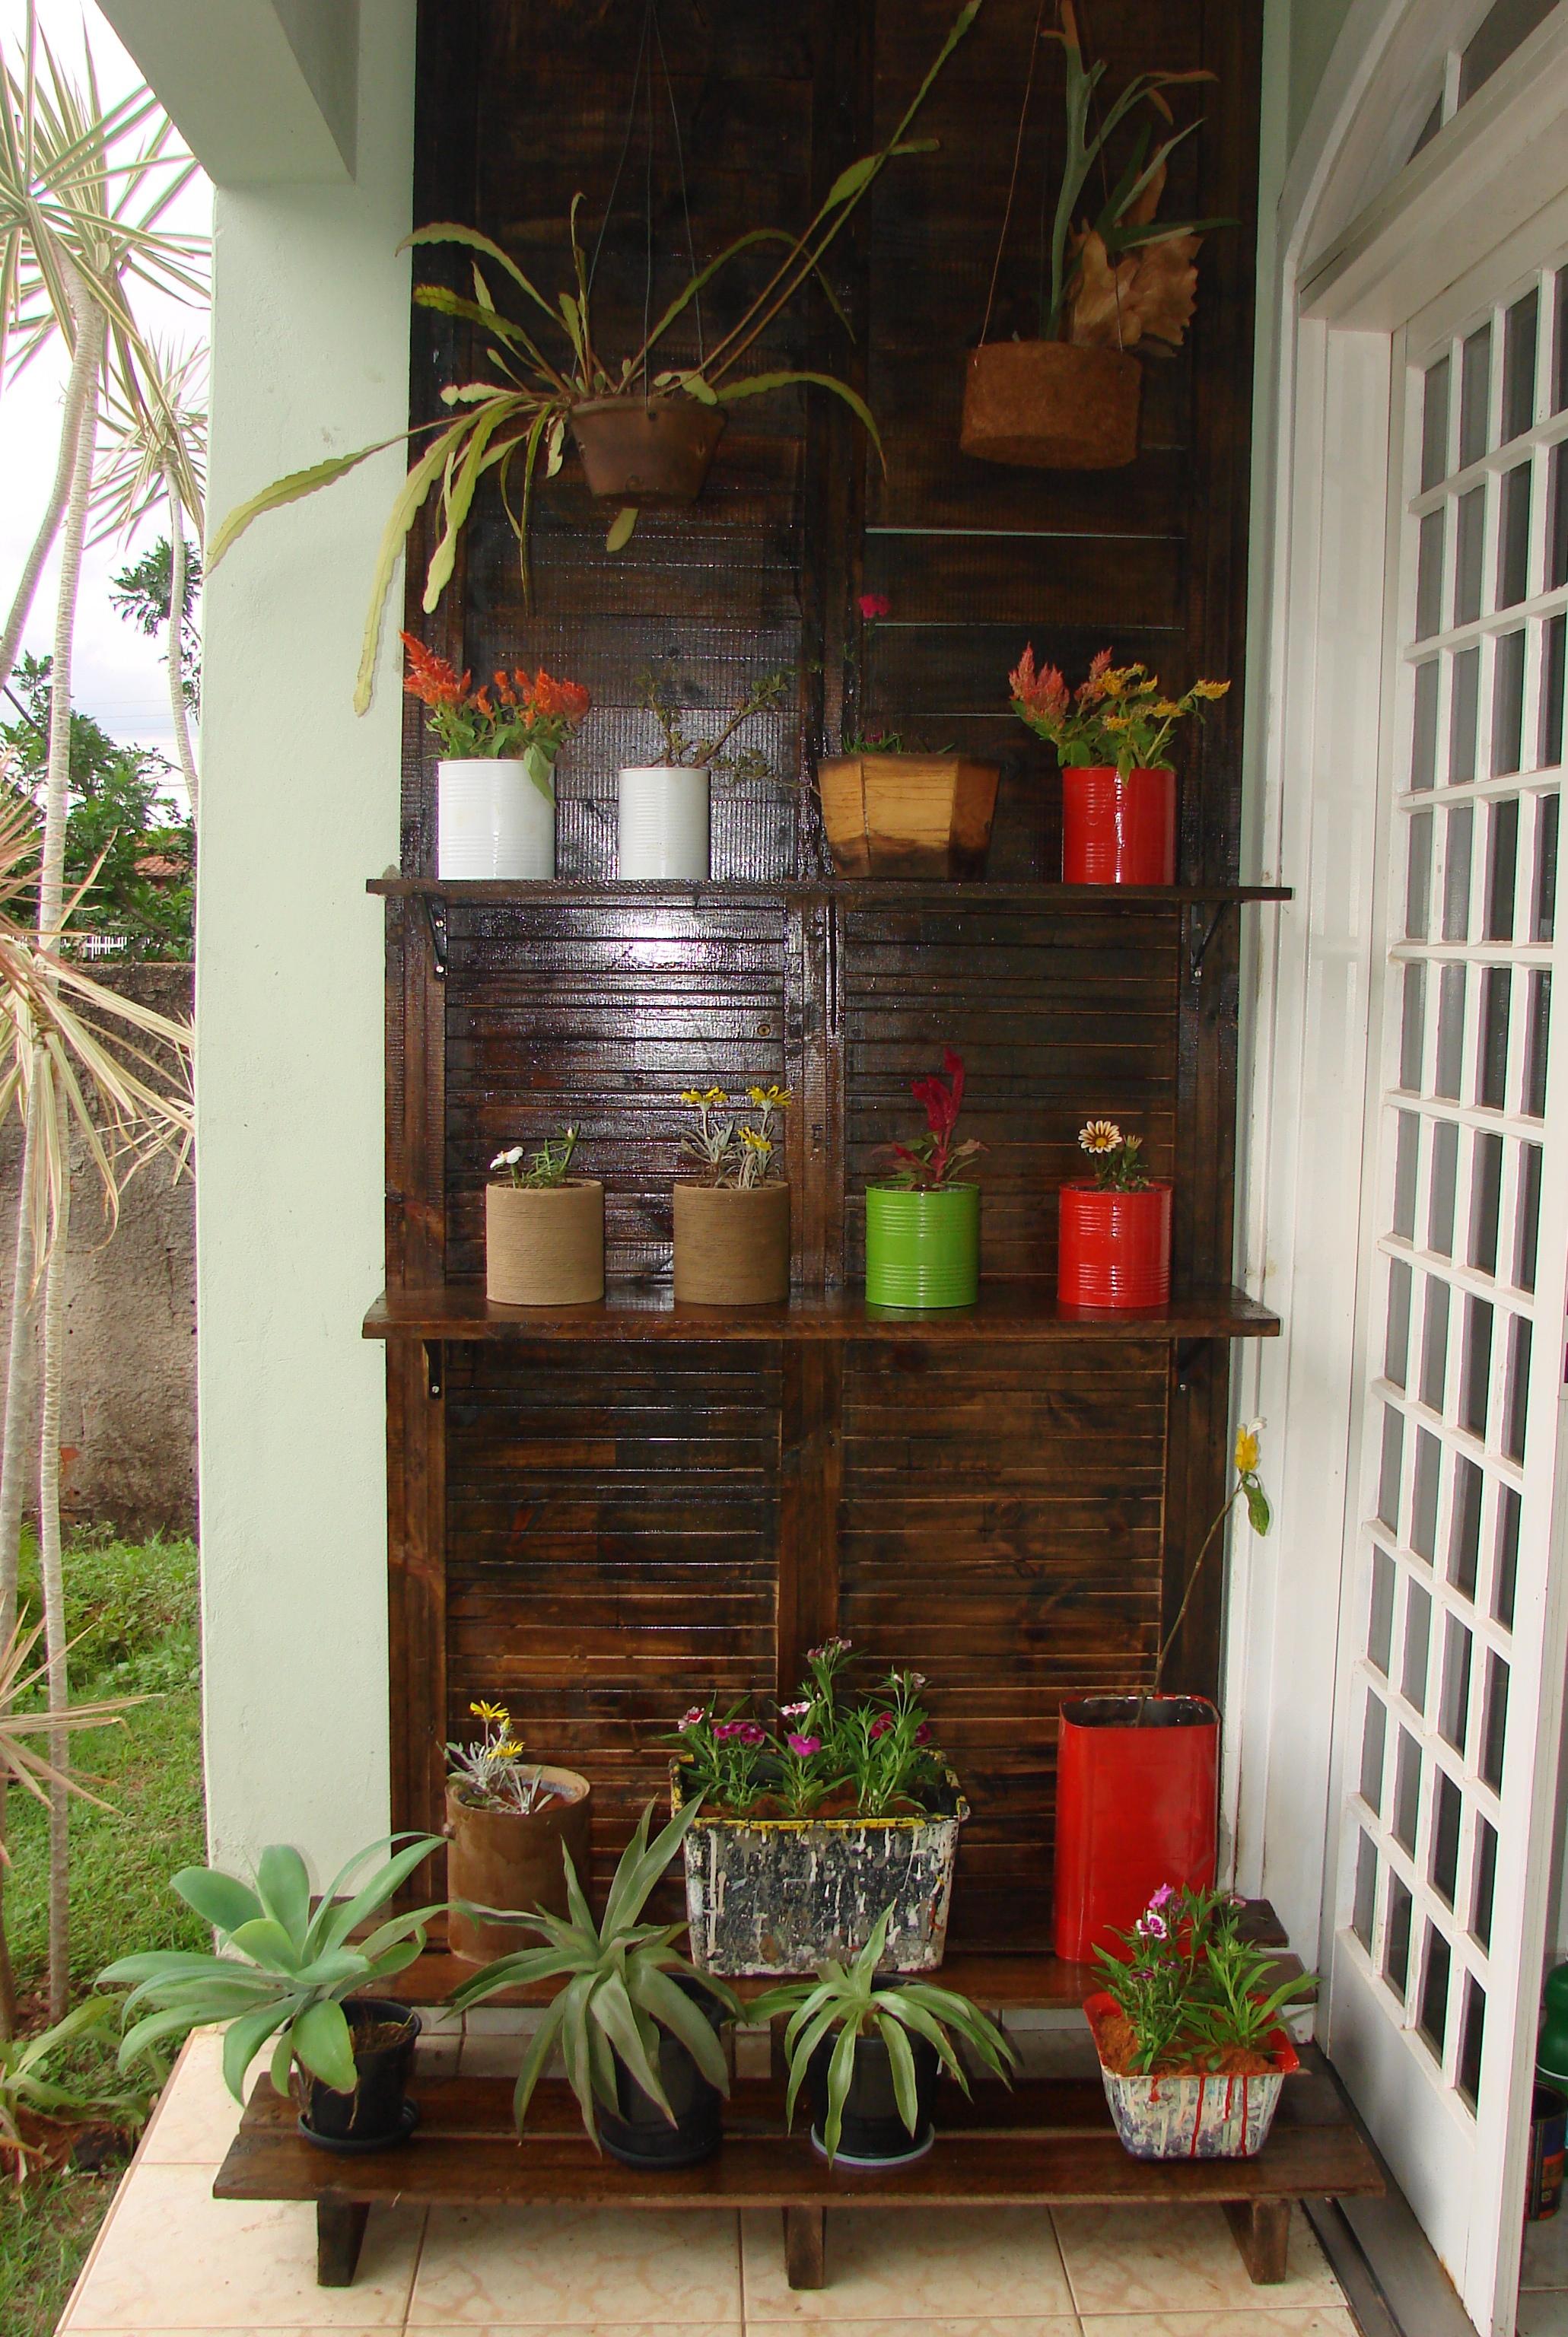 jardim vertical feito de paletes:jardim vertical jardim vertical  #B72315 2061x3072